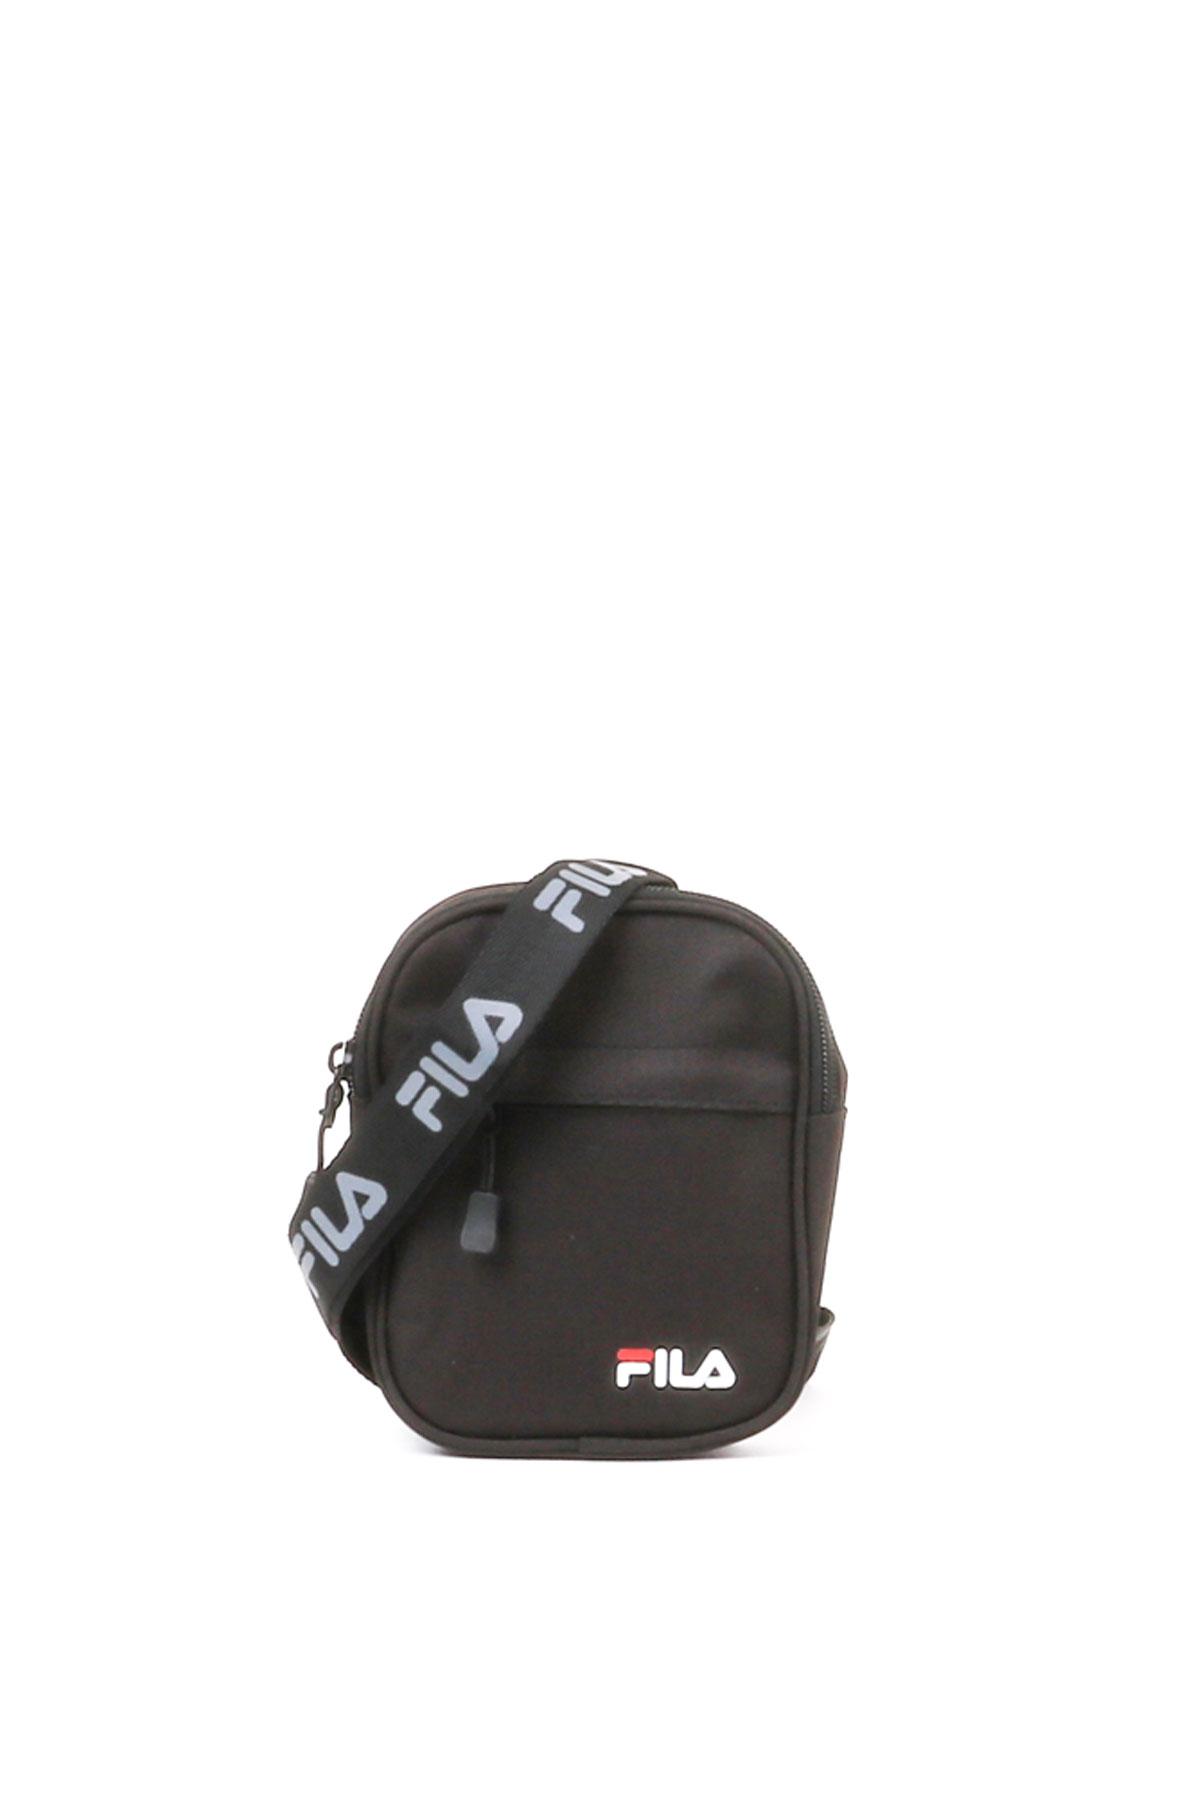 8d7df81411 MINI BAG BERLIN BLACK - FILA - Carbone Boutique